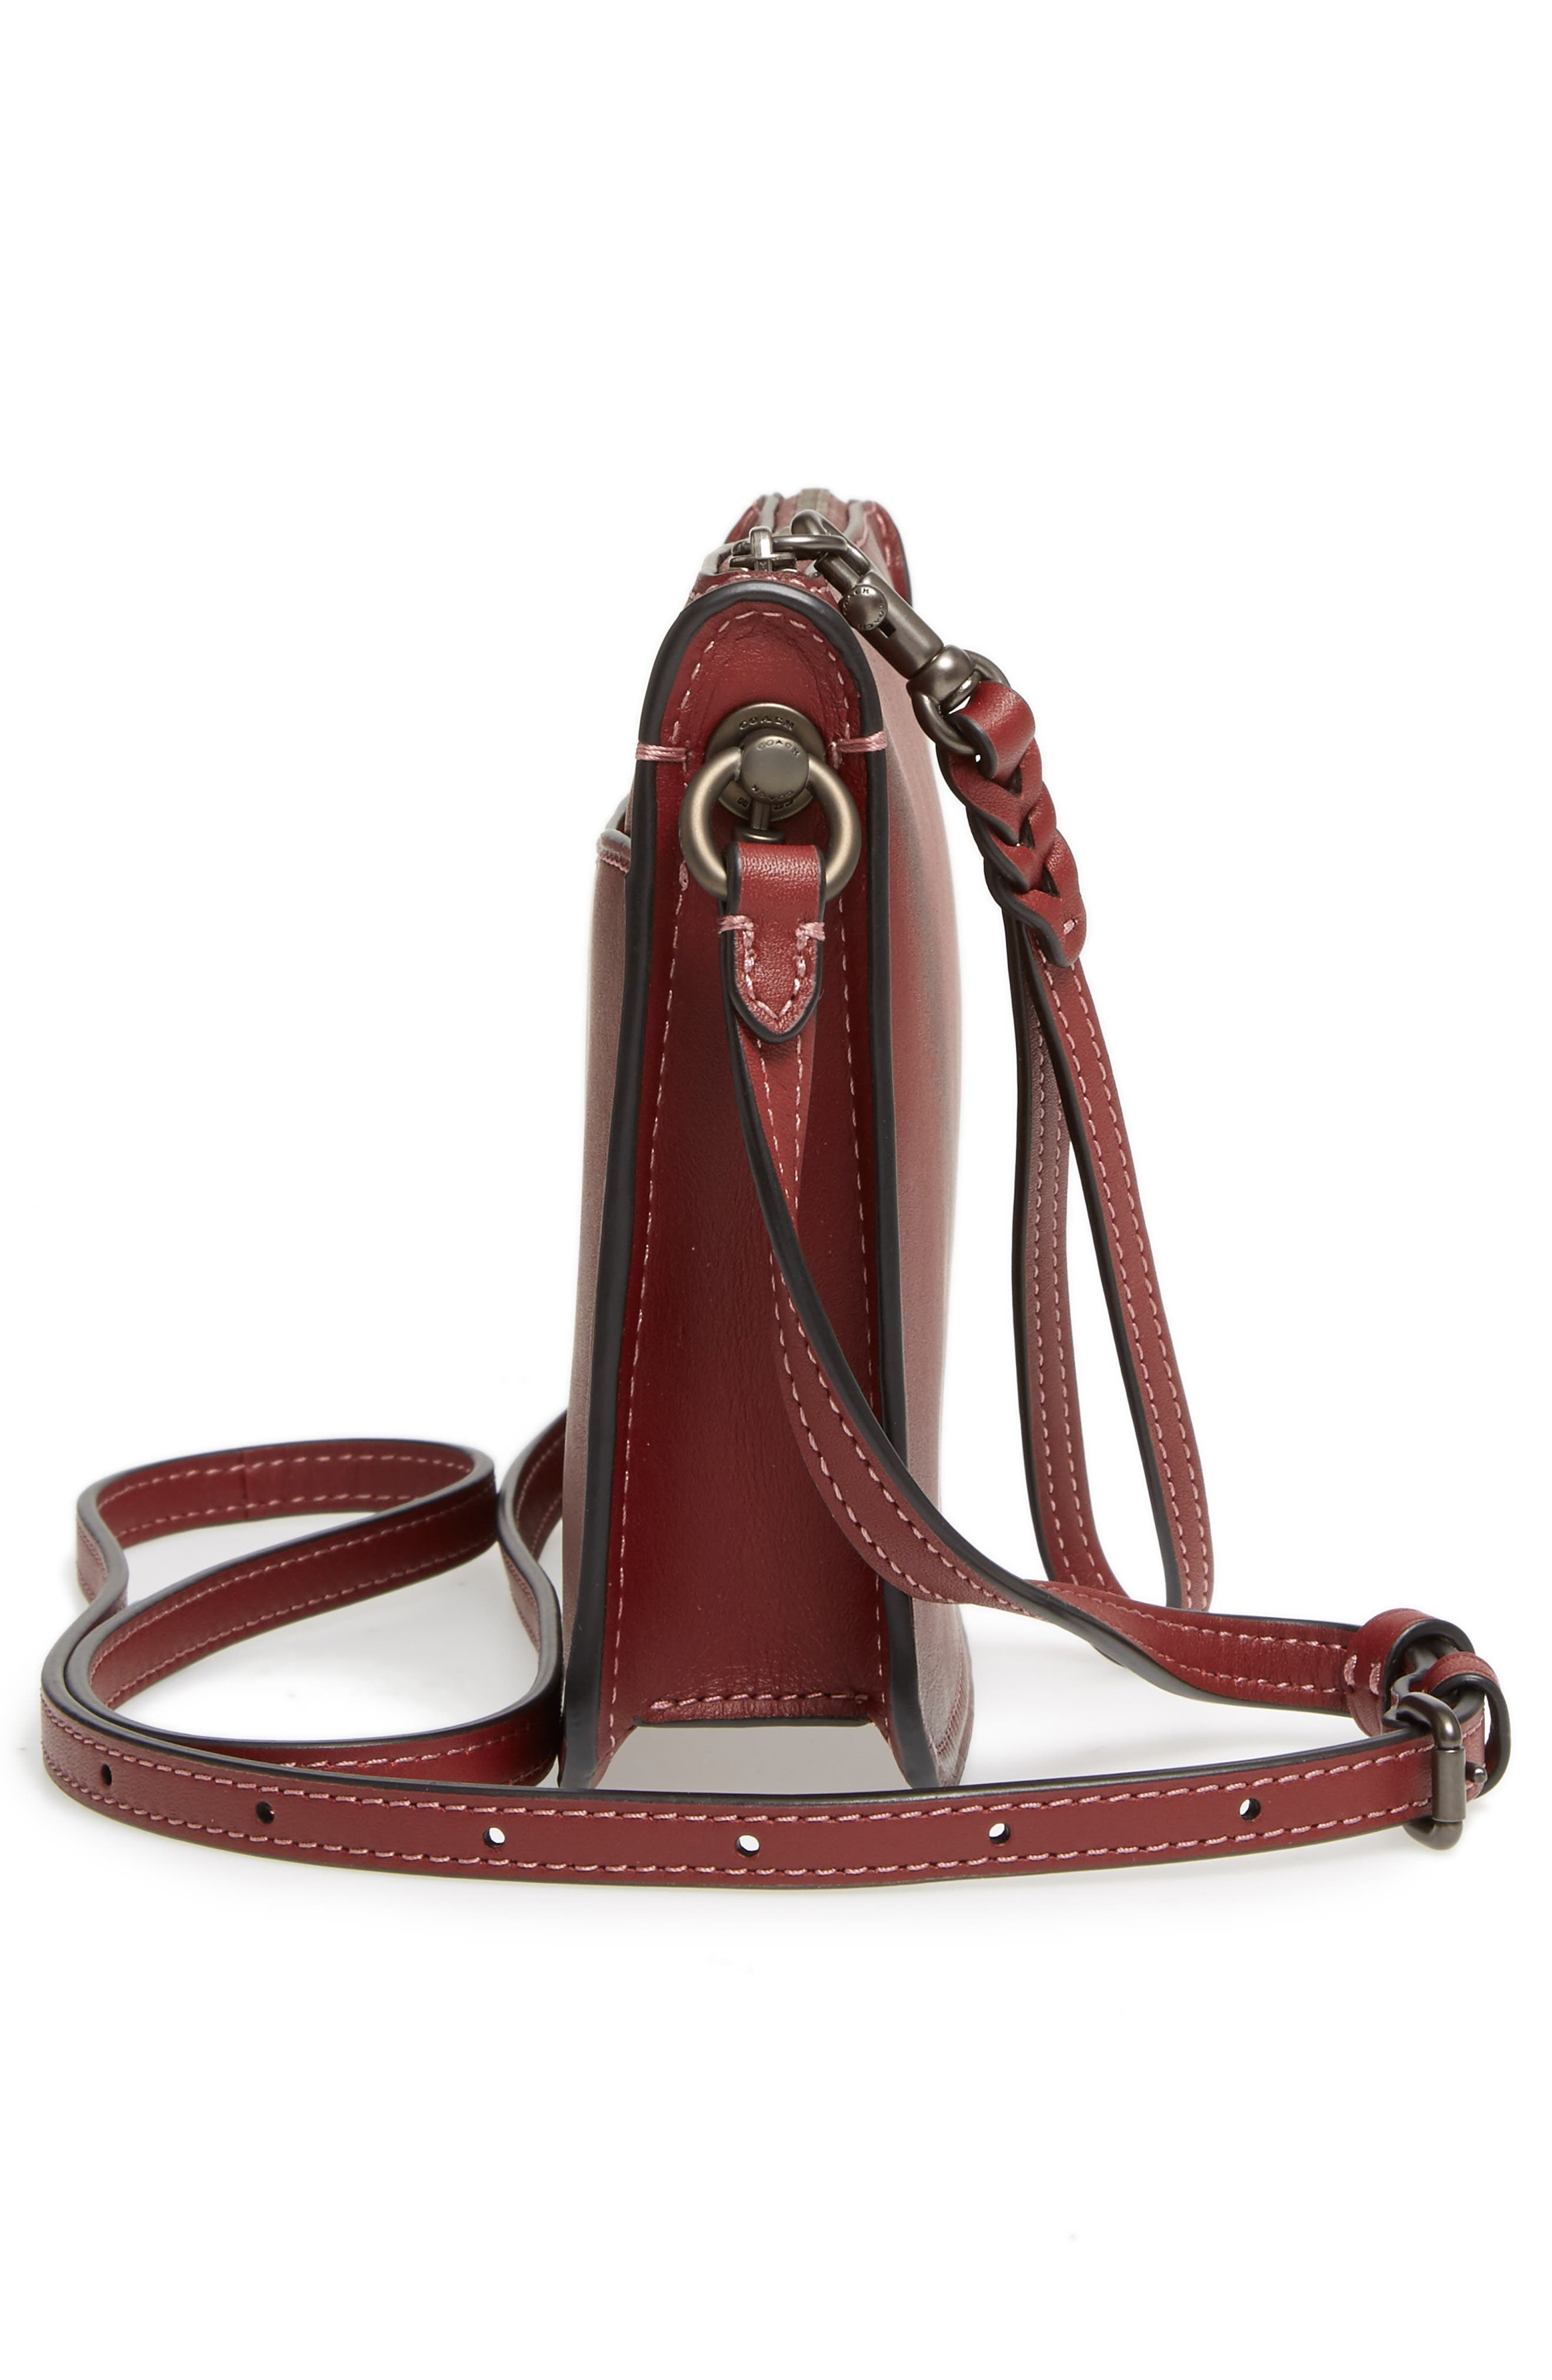 Soho Leather Crossbody Bag,                             Alternate thumbnail 5, color,                             614